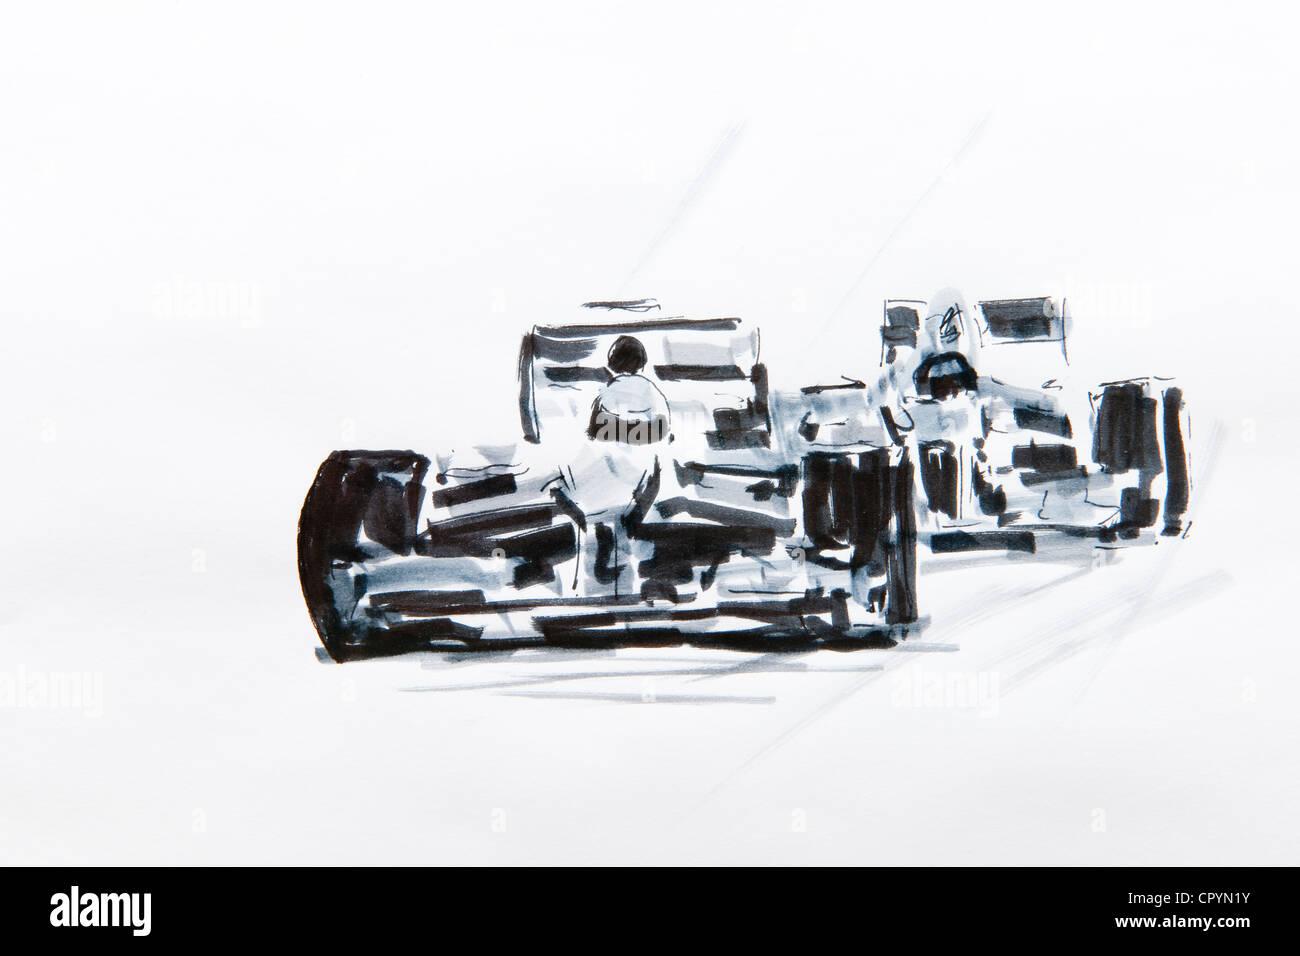 Formula One car racing, drawing by Gerhard Kraus, Kriftel, Germany - Stock Image